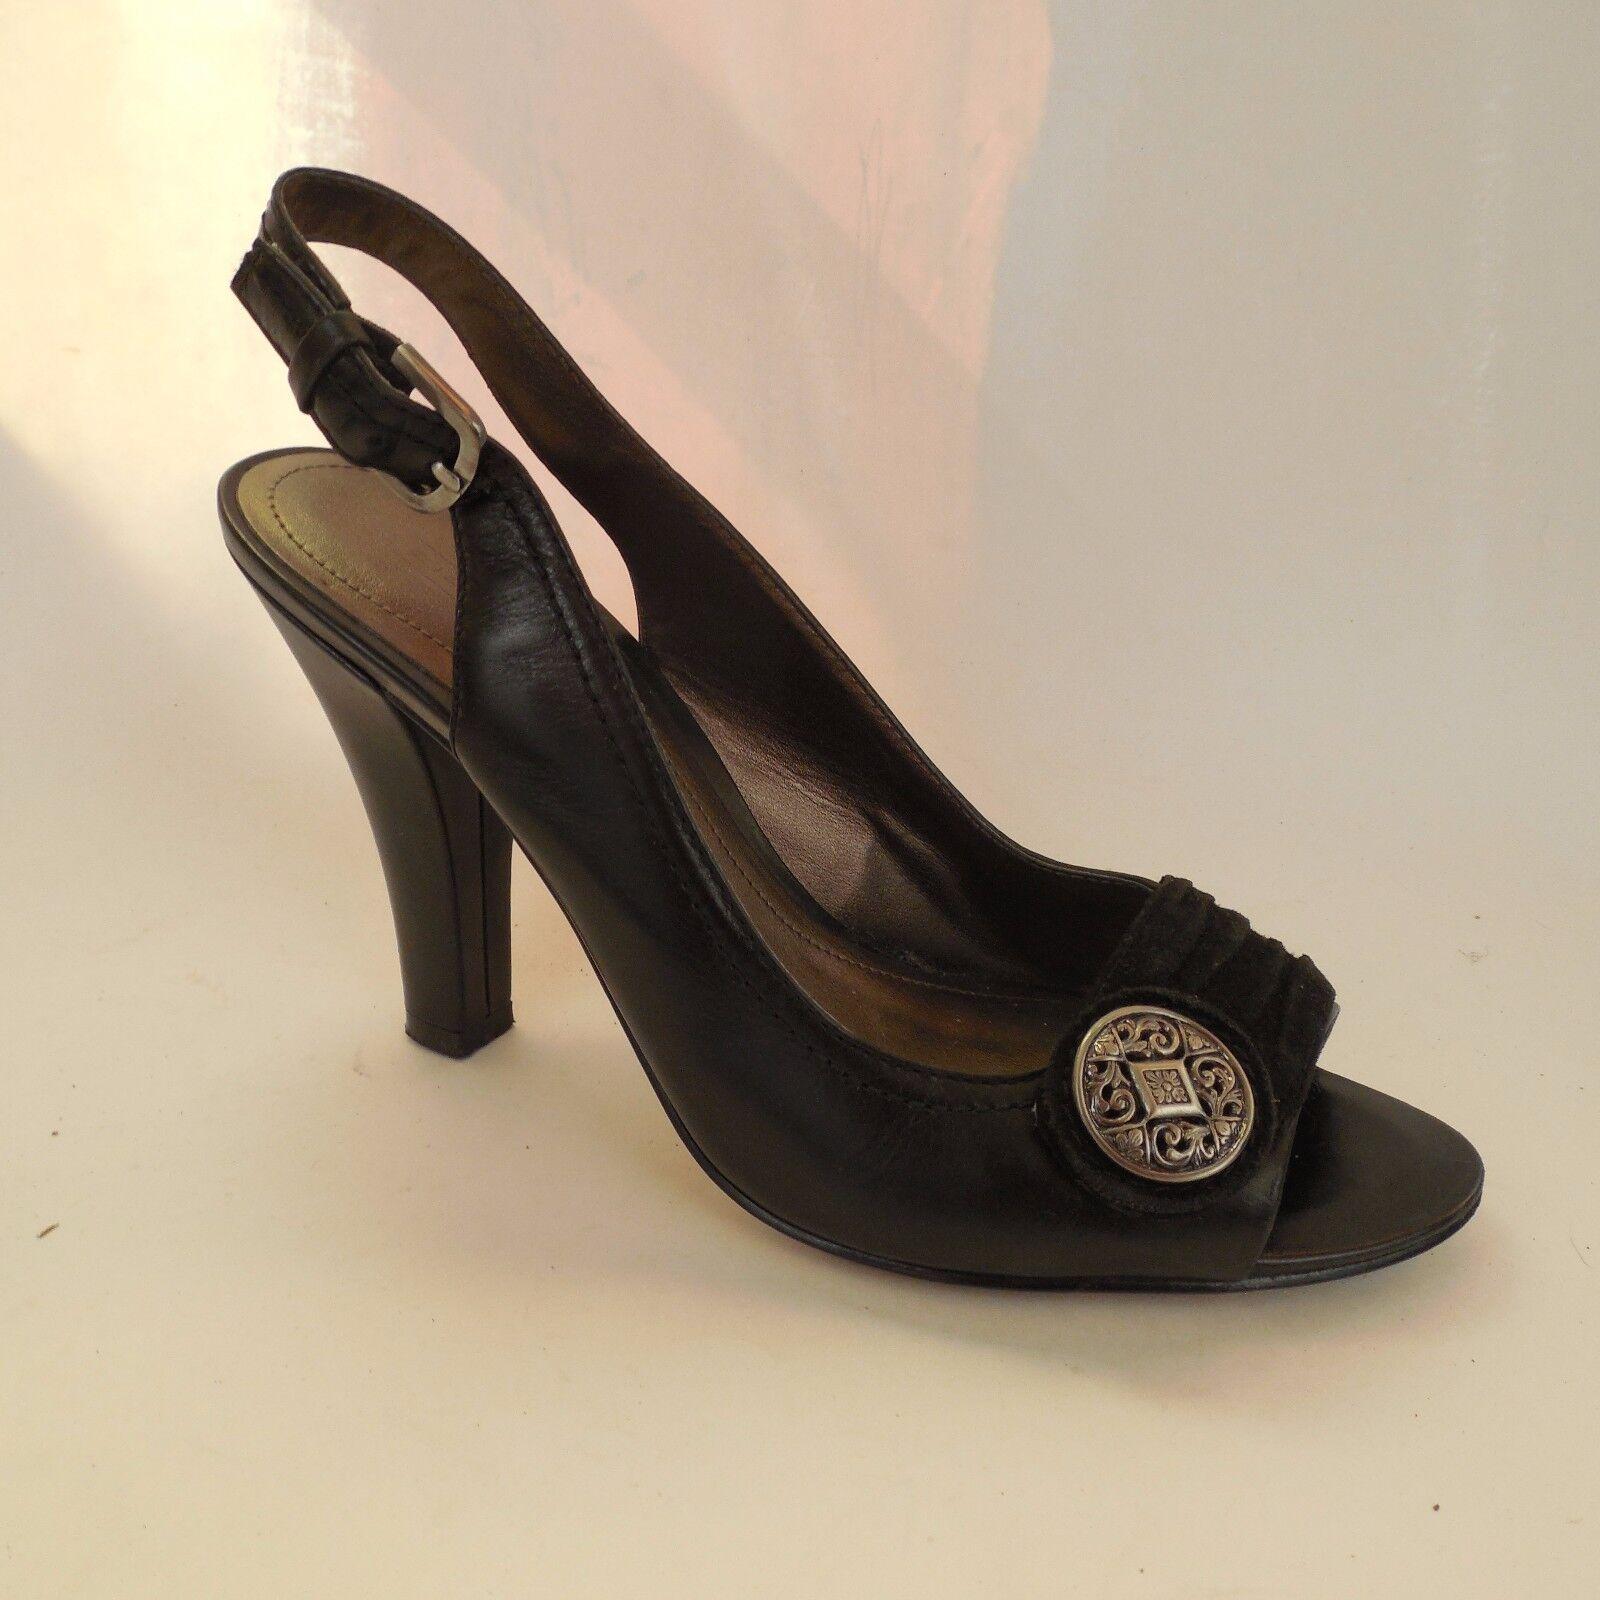 Joan & David CJKeely Black Leather Slingback Open Toe Pumps Heels 6 M Heels GUC